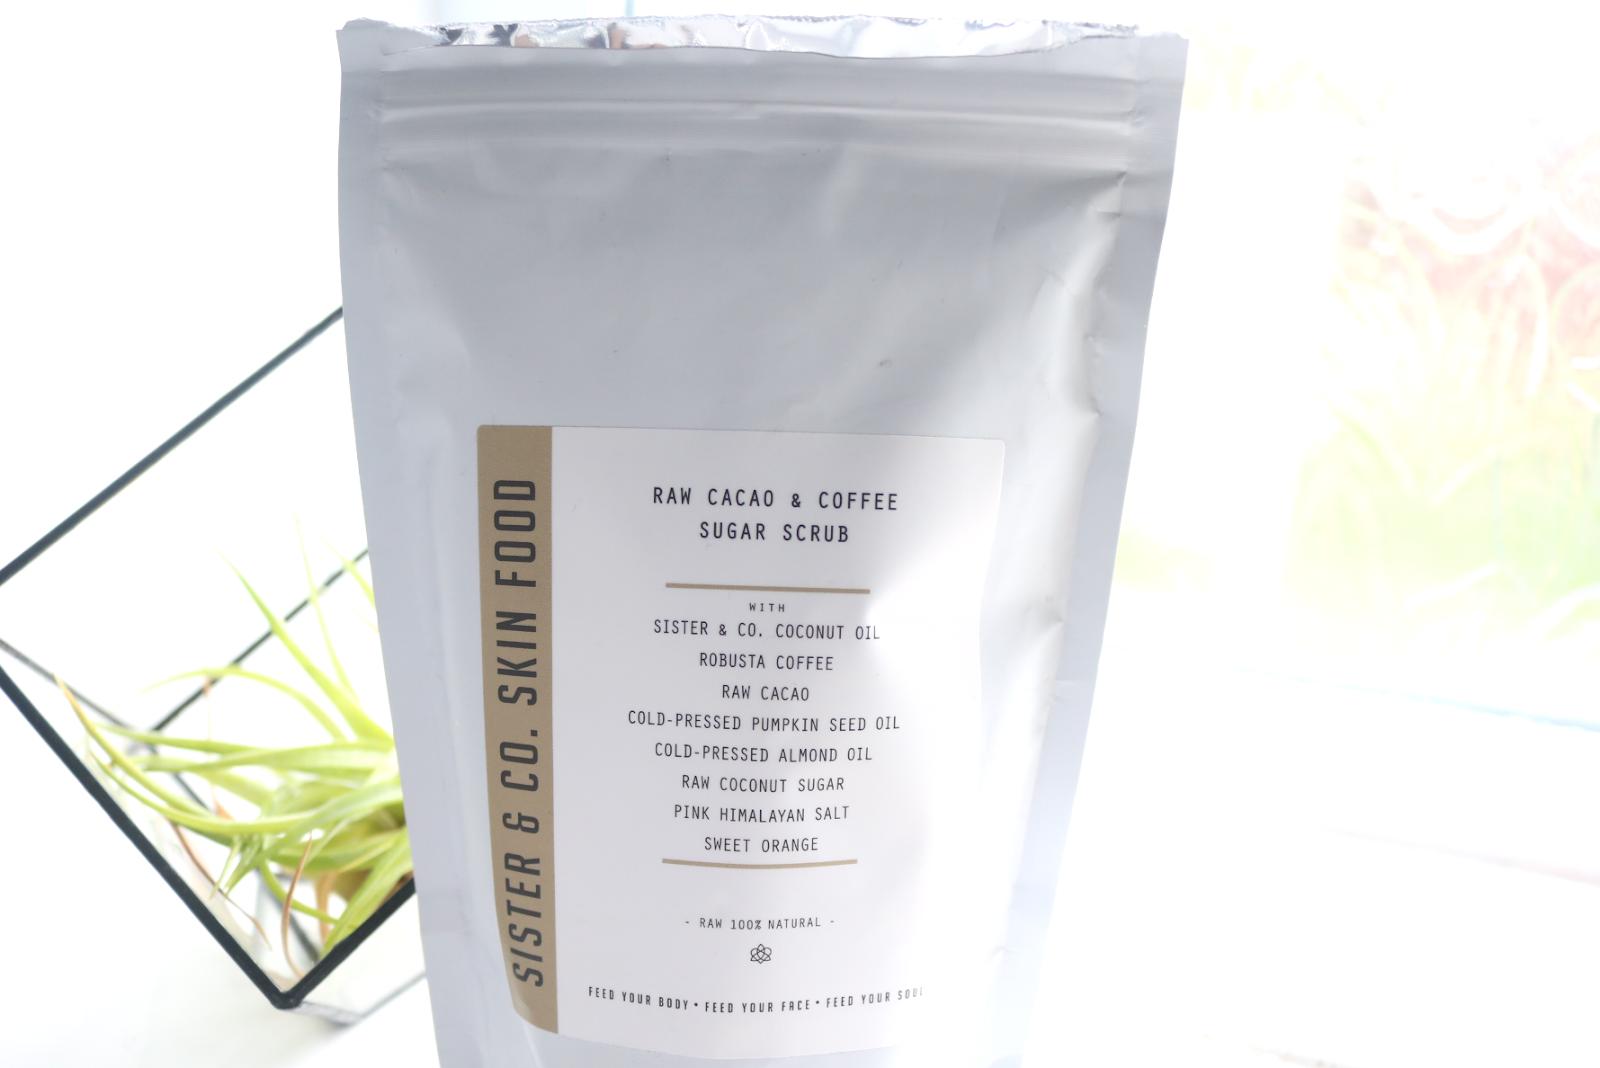 Sister & Co Raw Cacao & Coffee Sugar Scrub review